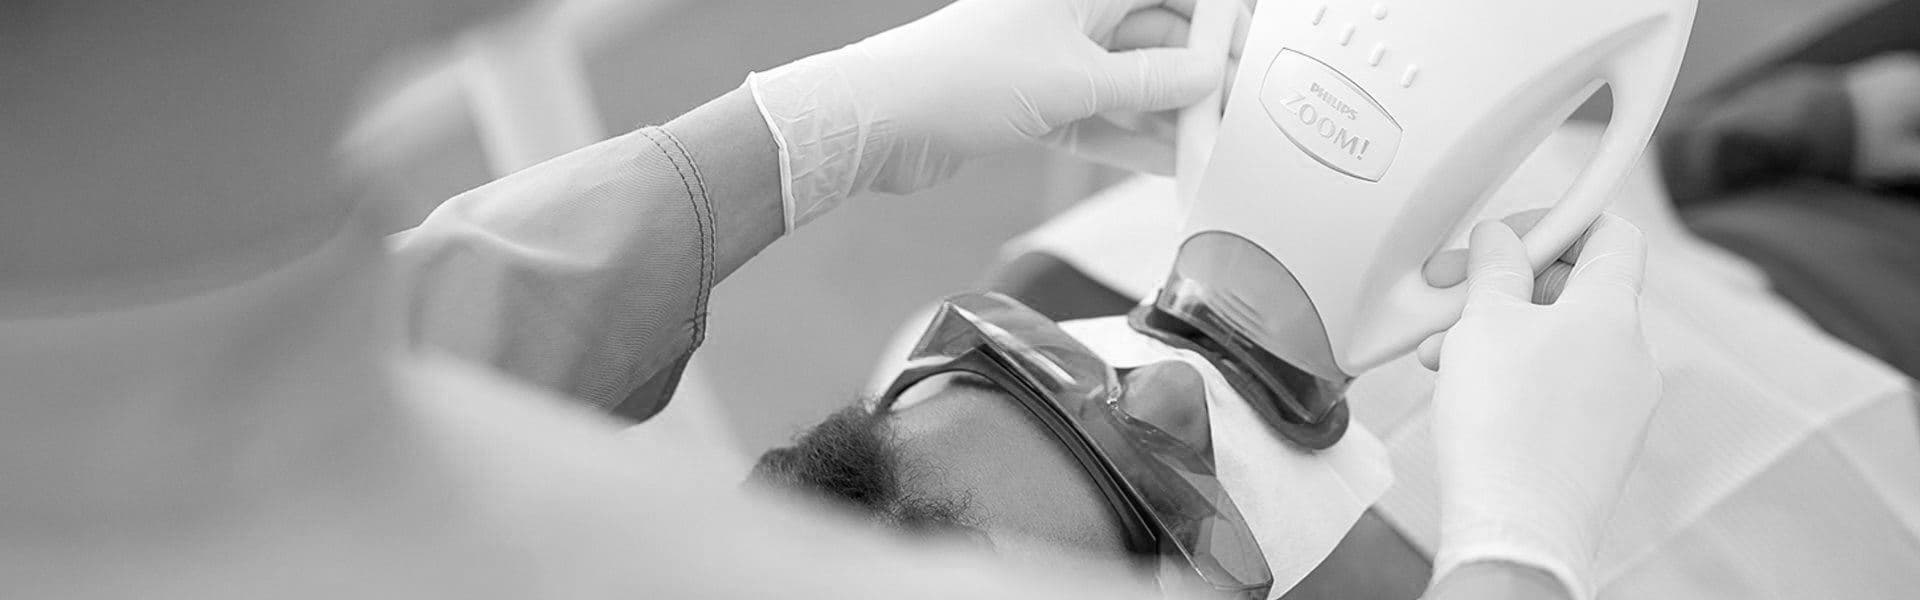 Отбеливание зубов системой ZOOM 4 фото